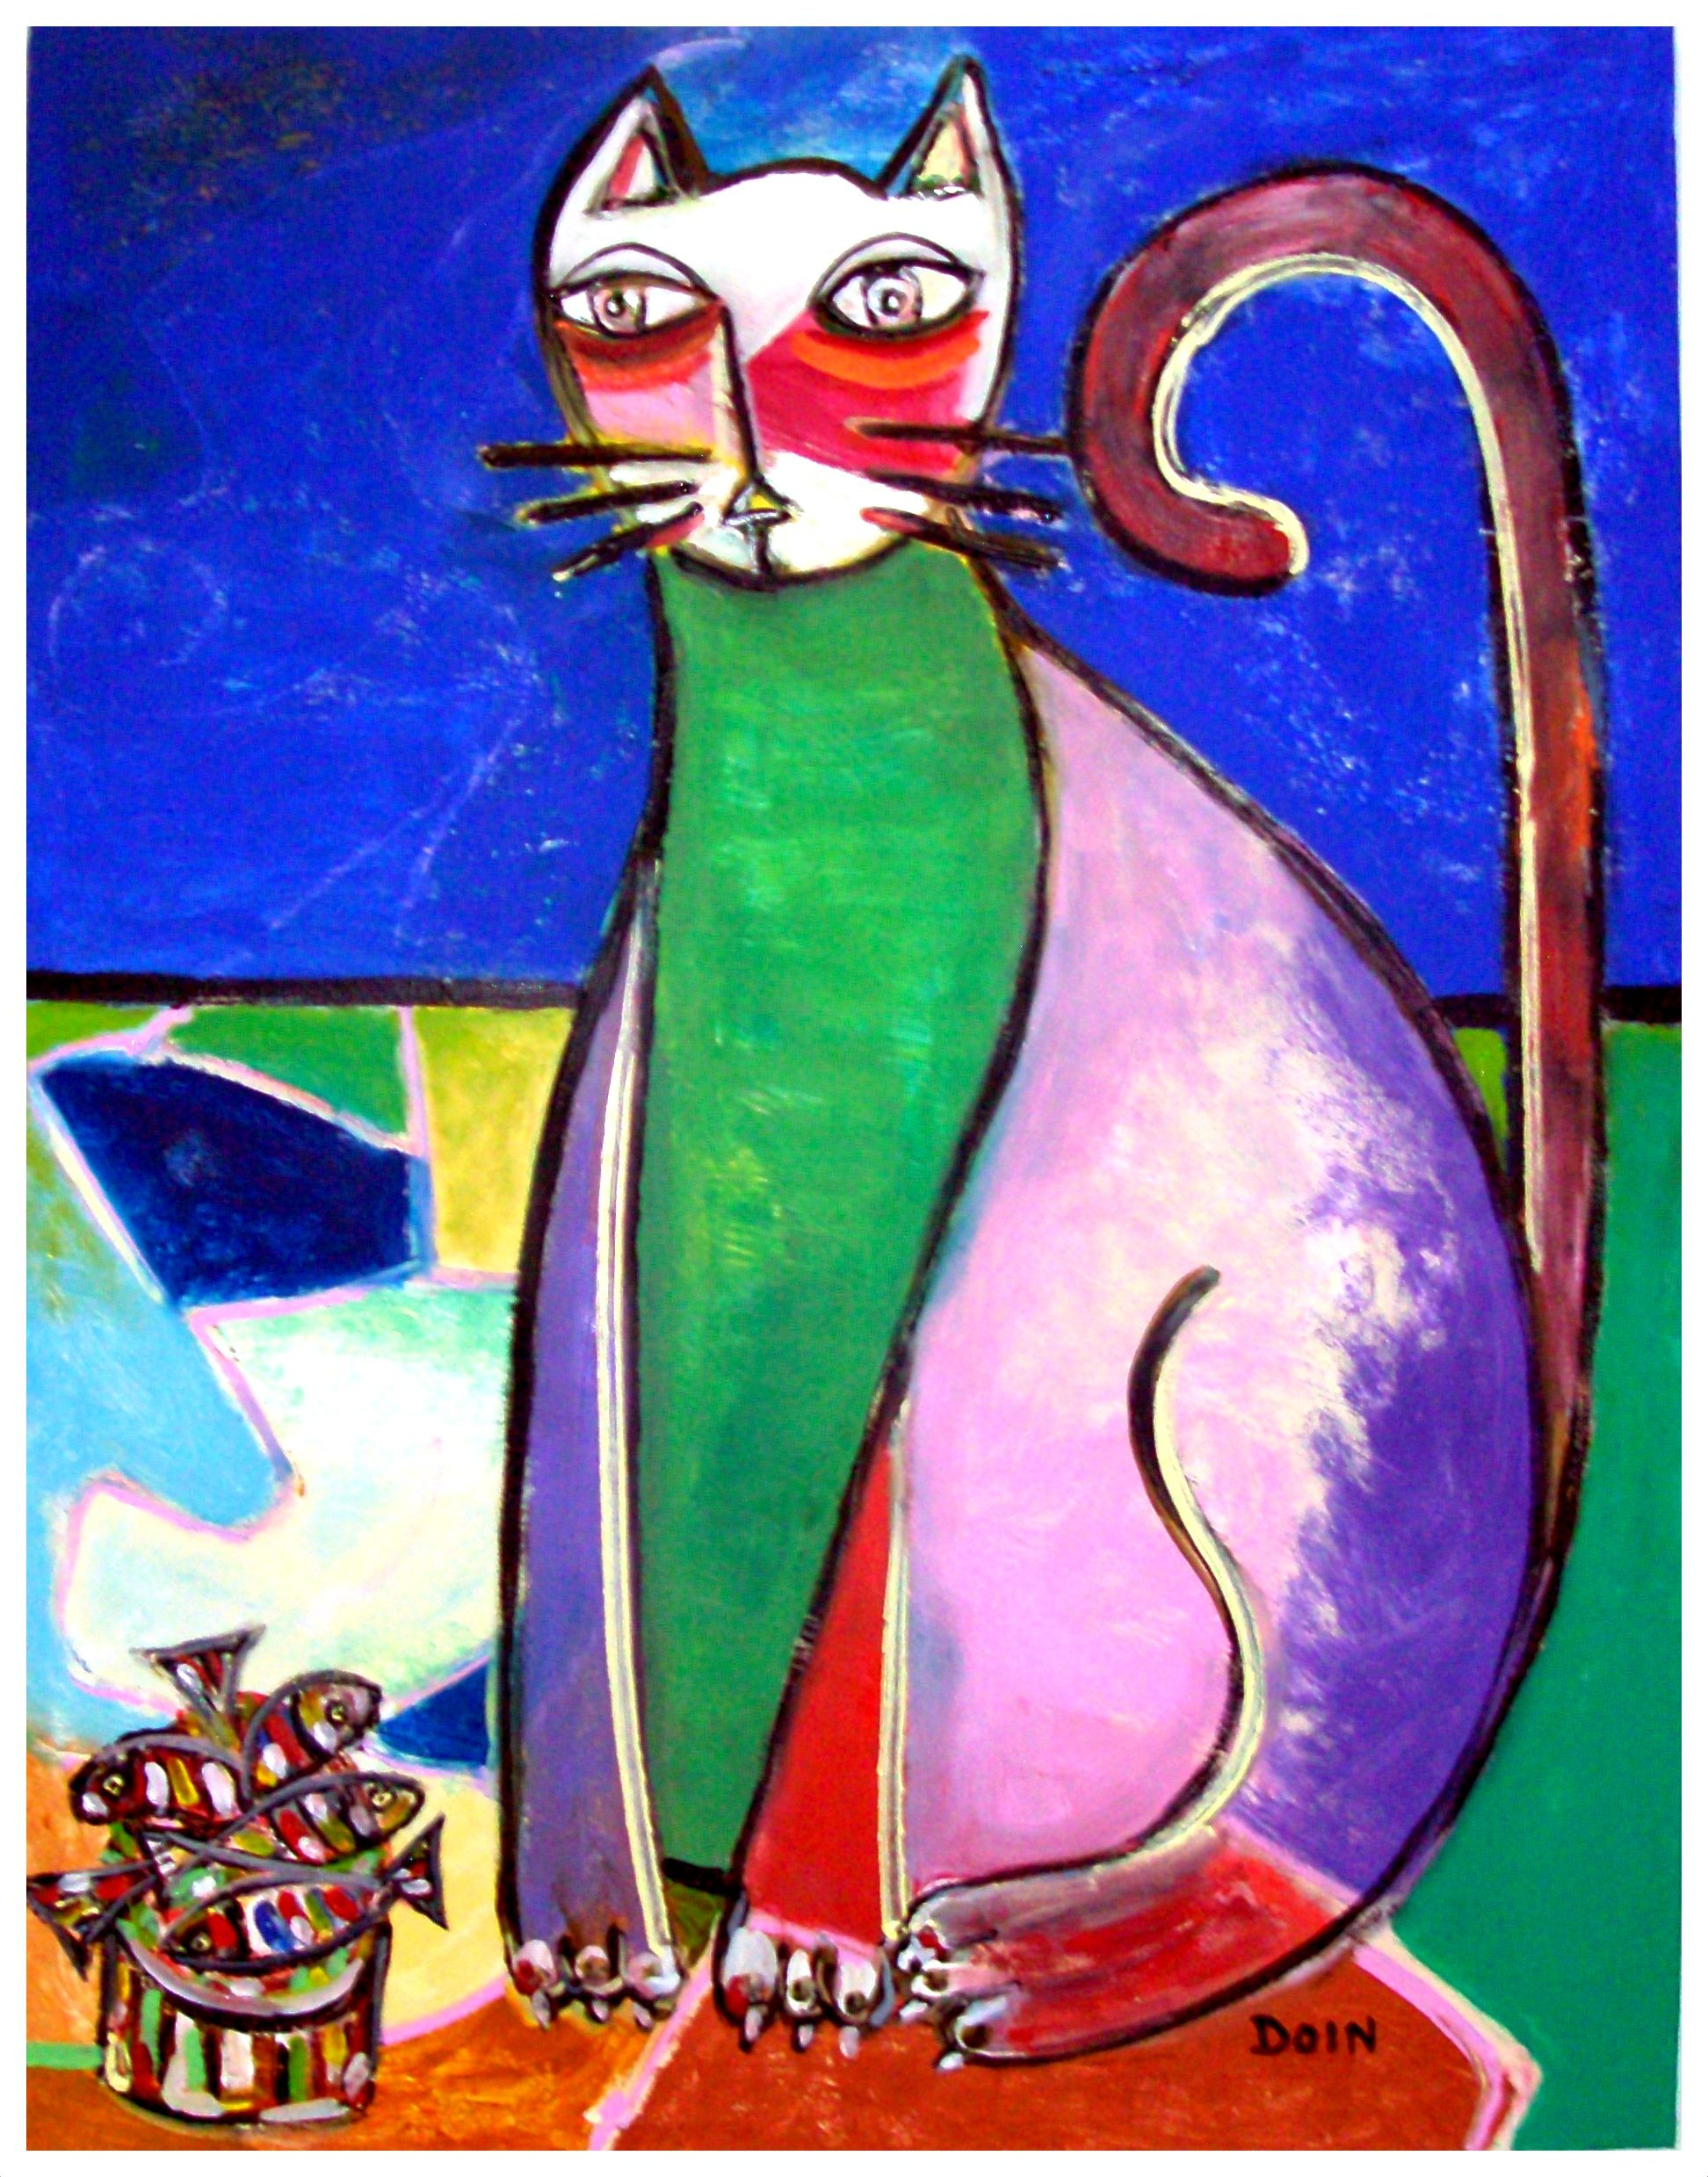 o.s.t. - 75 cm x 97 cm - o gato